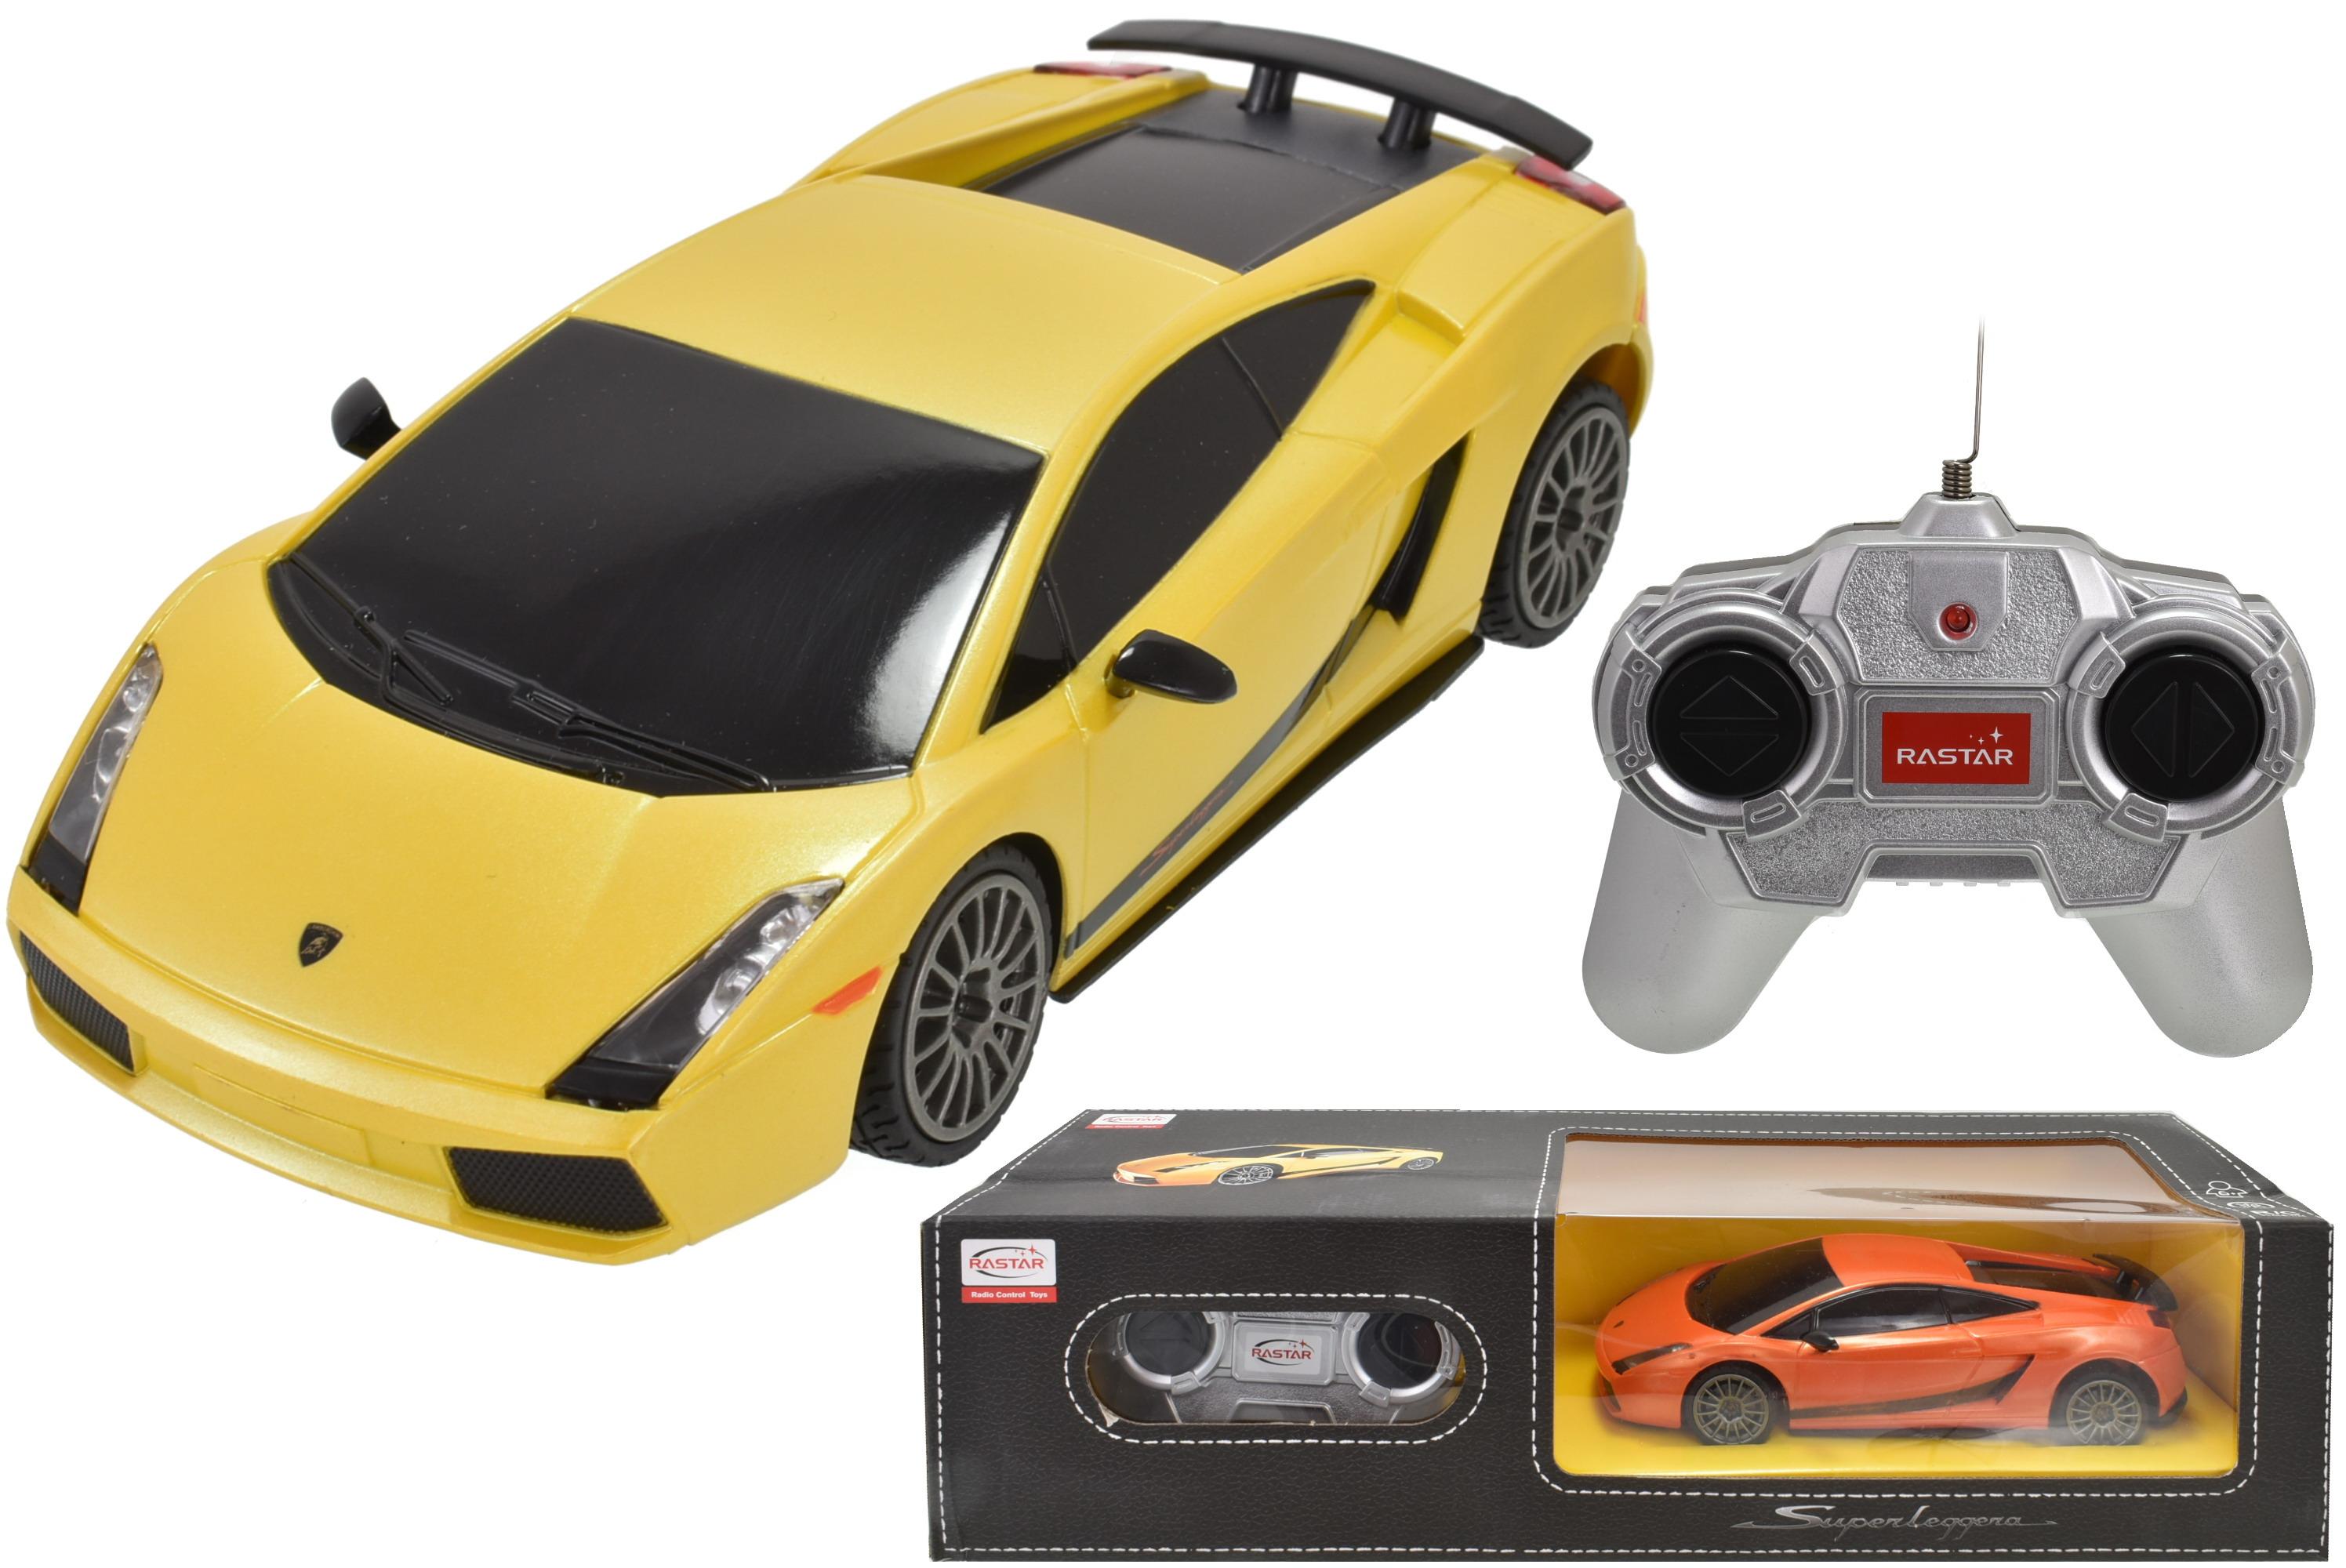 R/C Lamborghini 1:24sc In Window Box